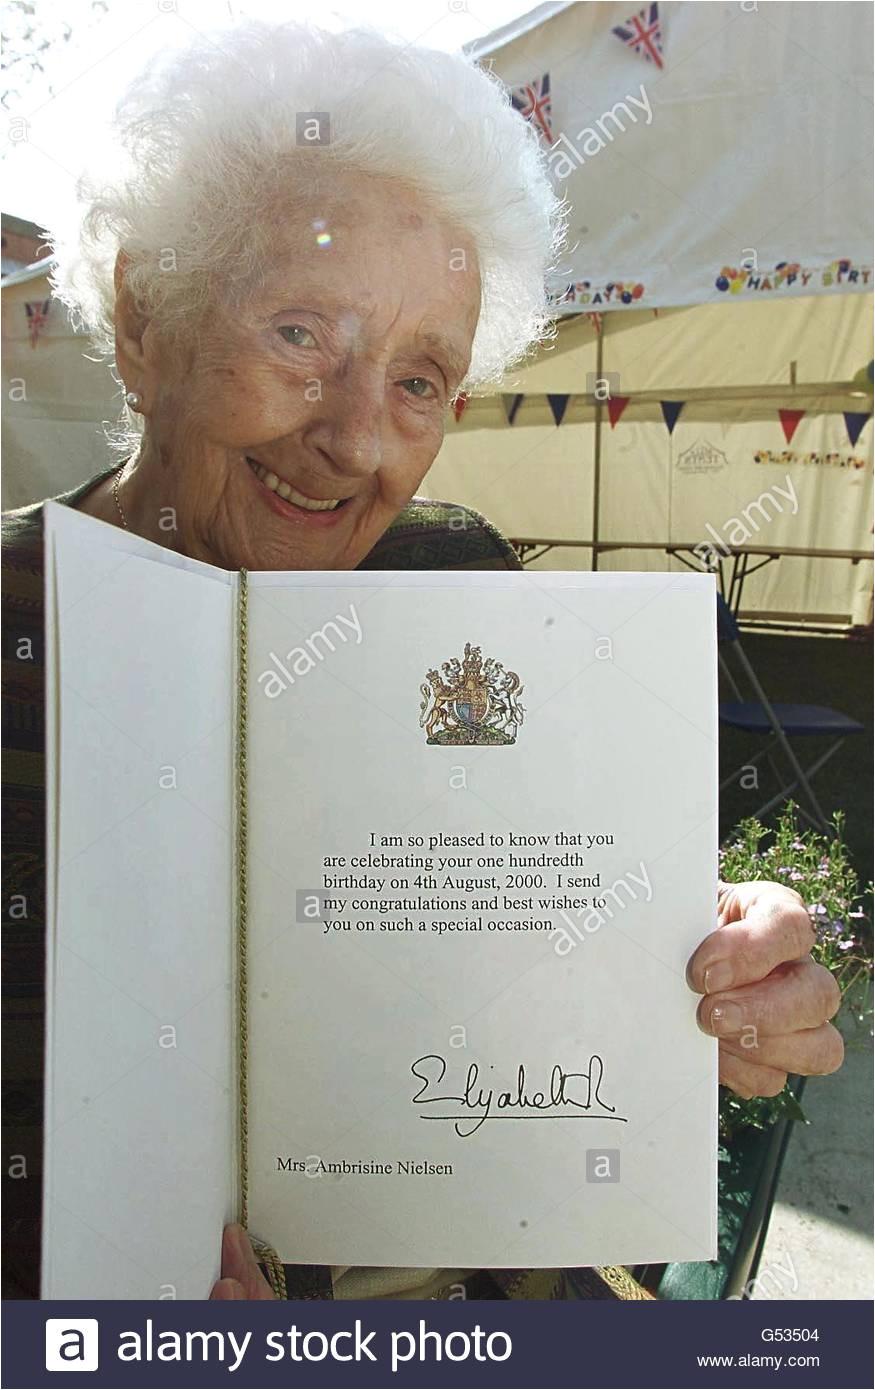 queen mother 100th birthday g53504 jpg